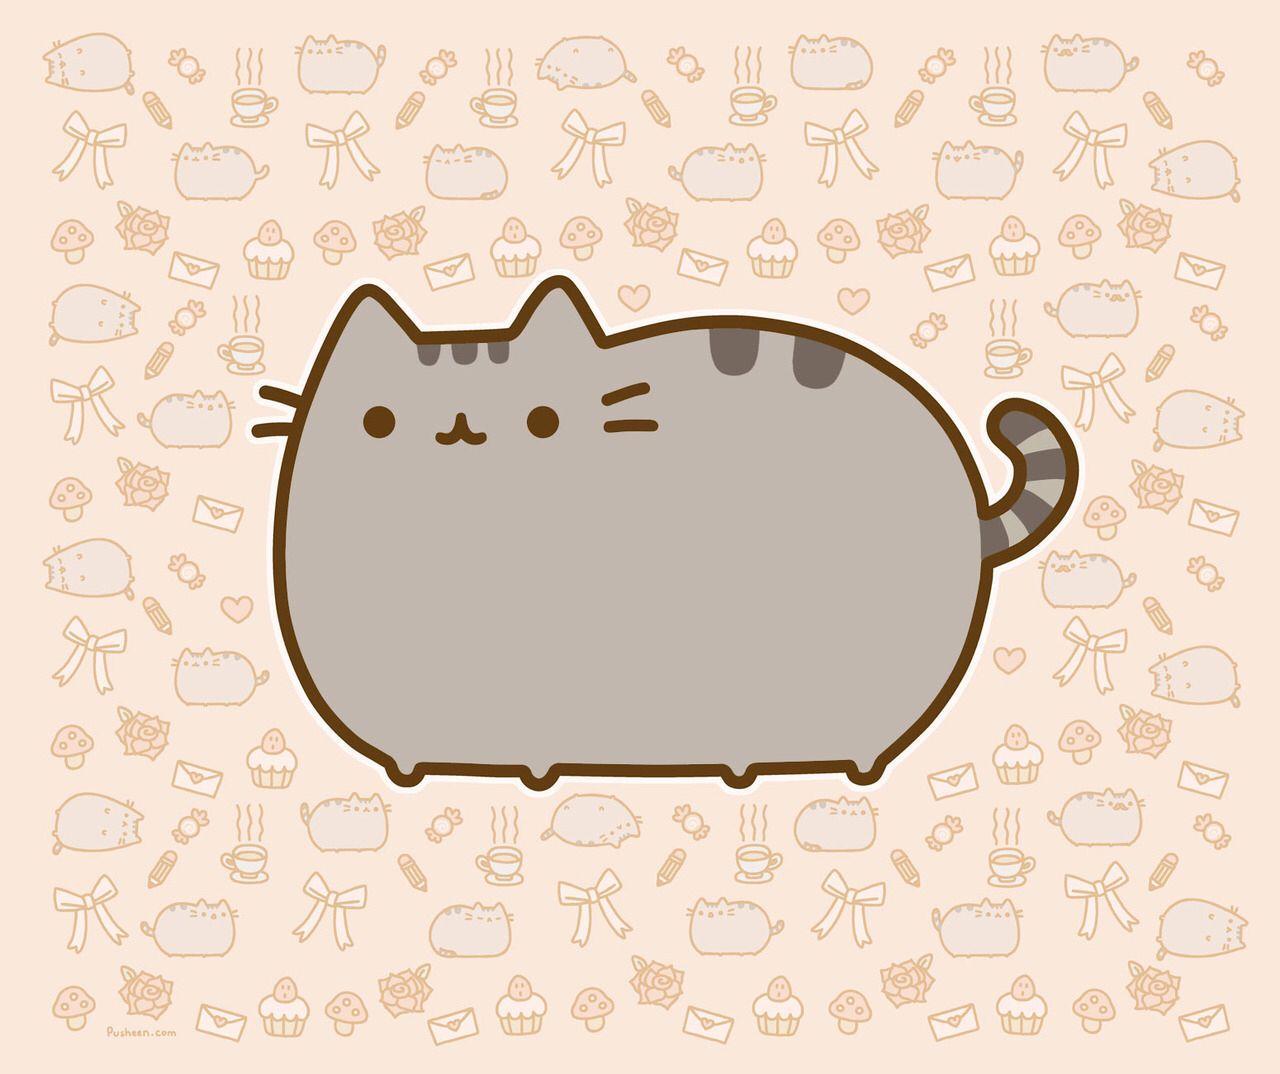 Pusheen The Cat Wallpapers Top Free Pusheen The Cat